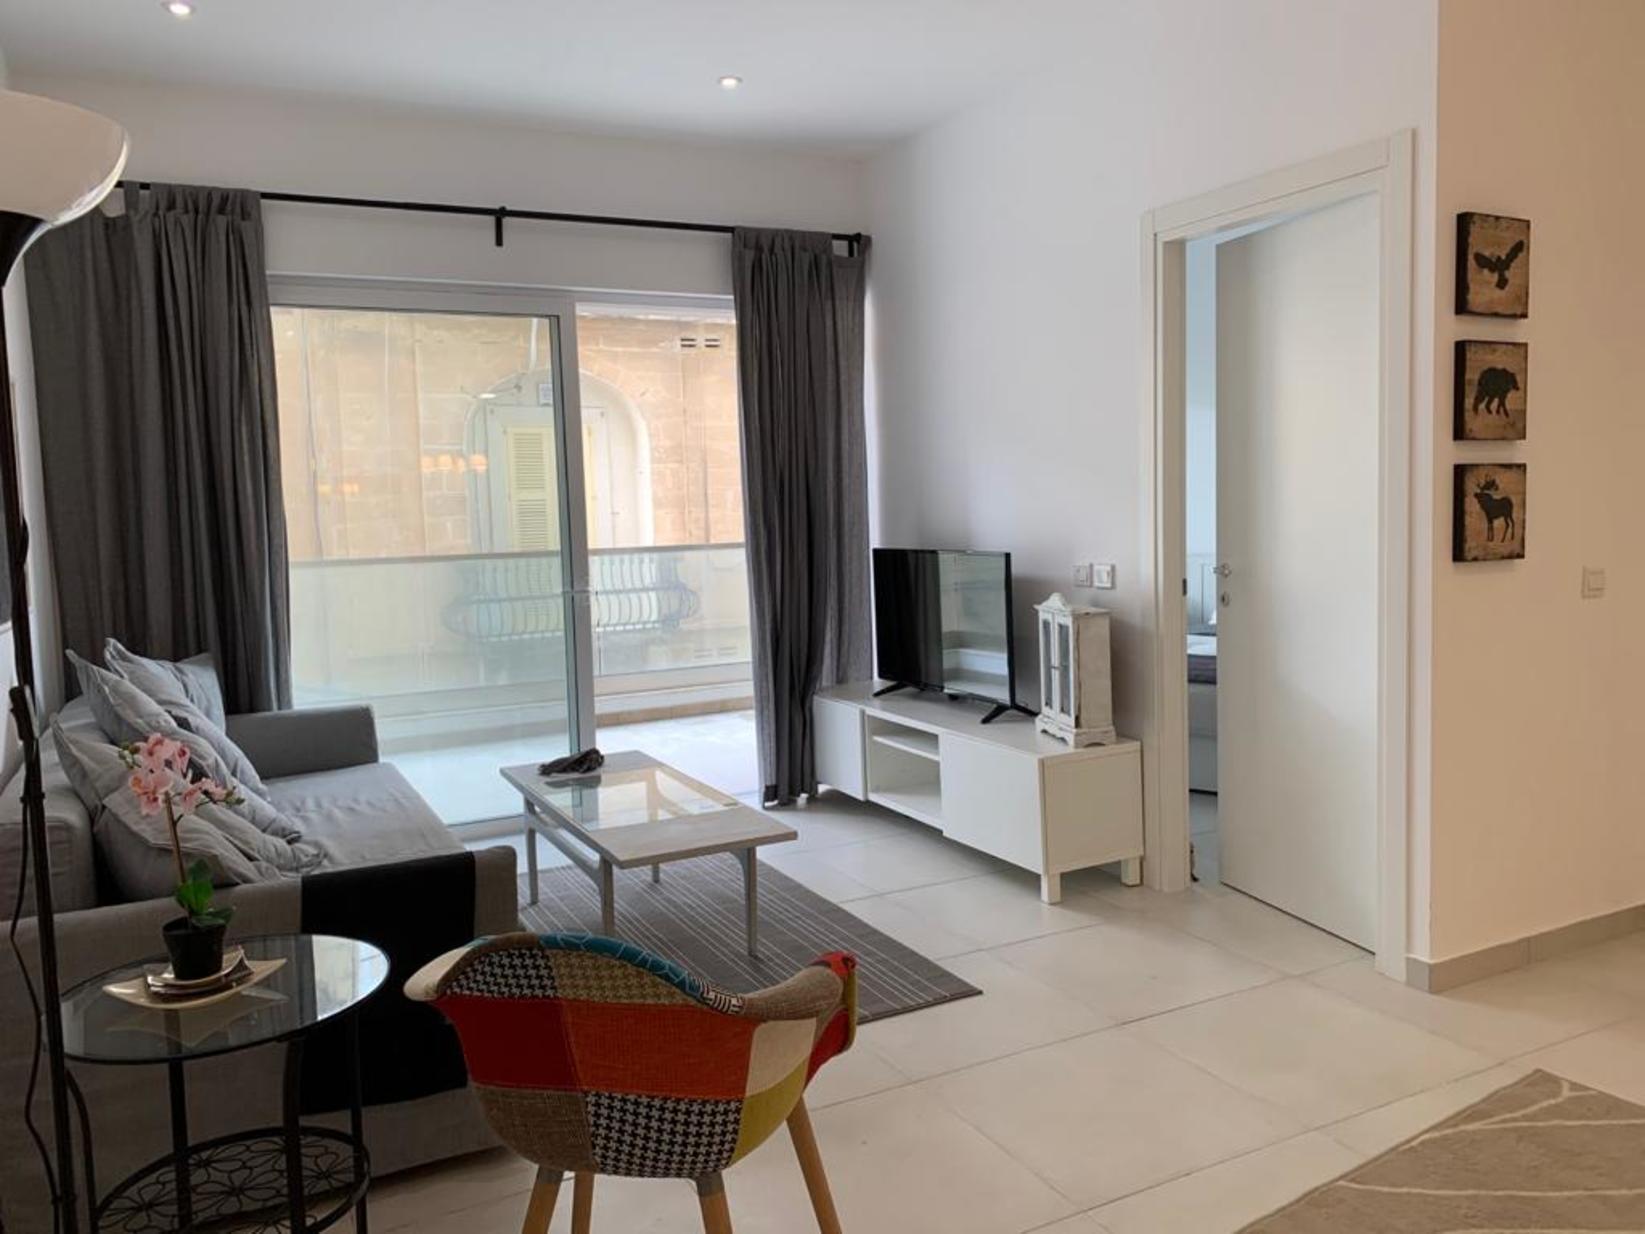 1 bed Apartment For Rent in Sliema, Sliema - thumb 2